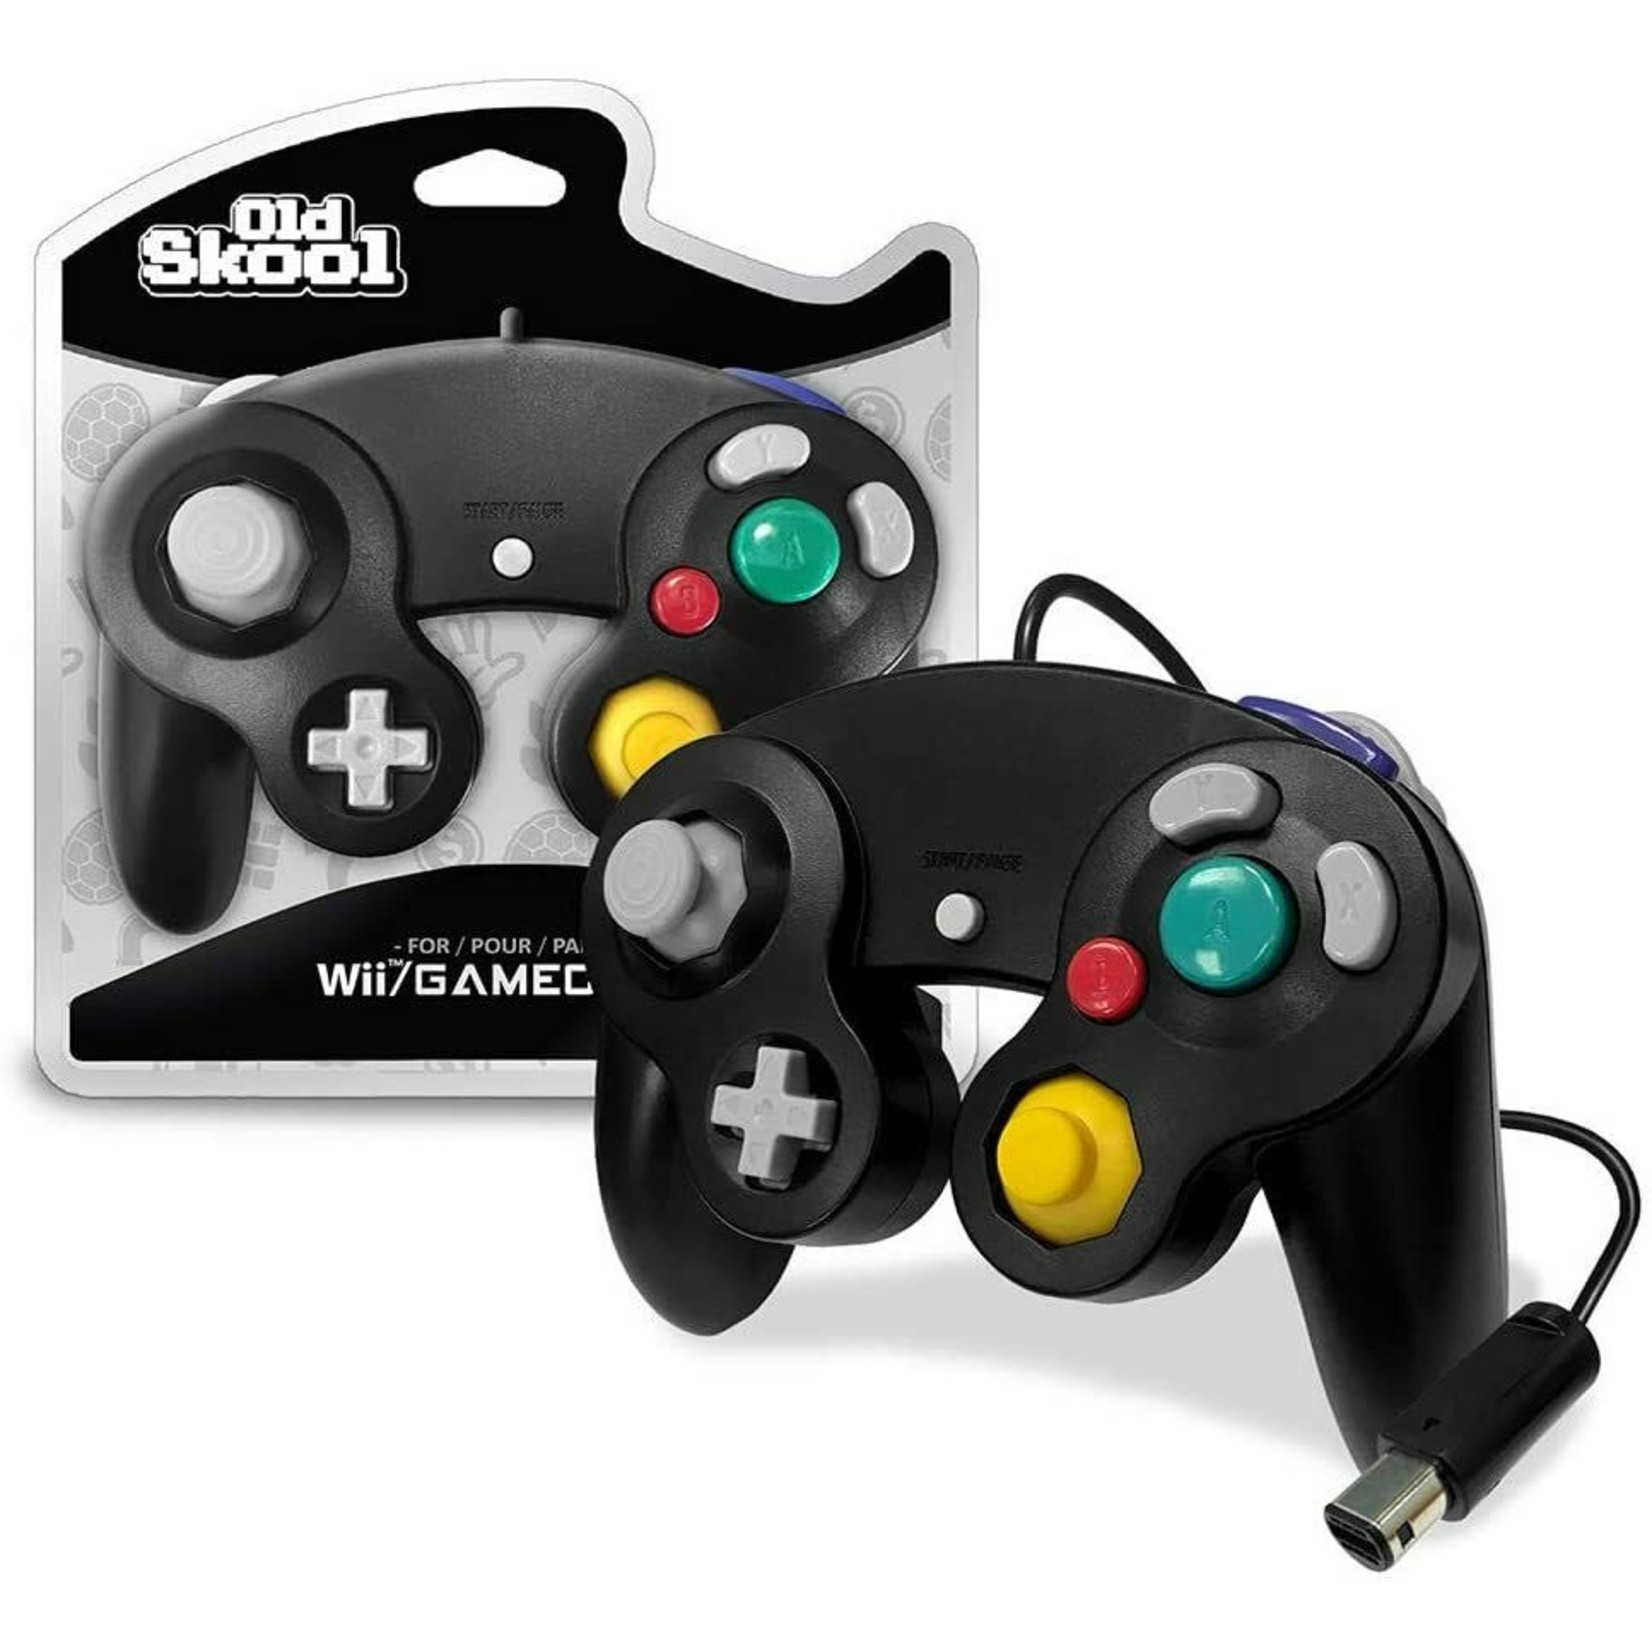 Old Skool Gamecube Controller